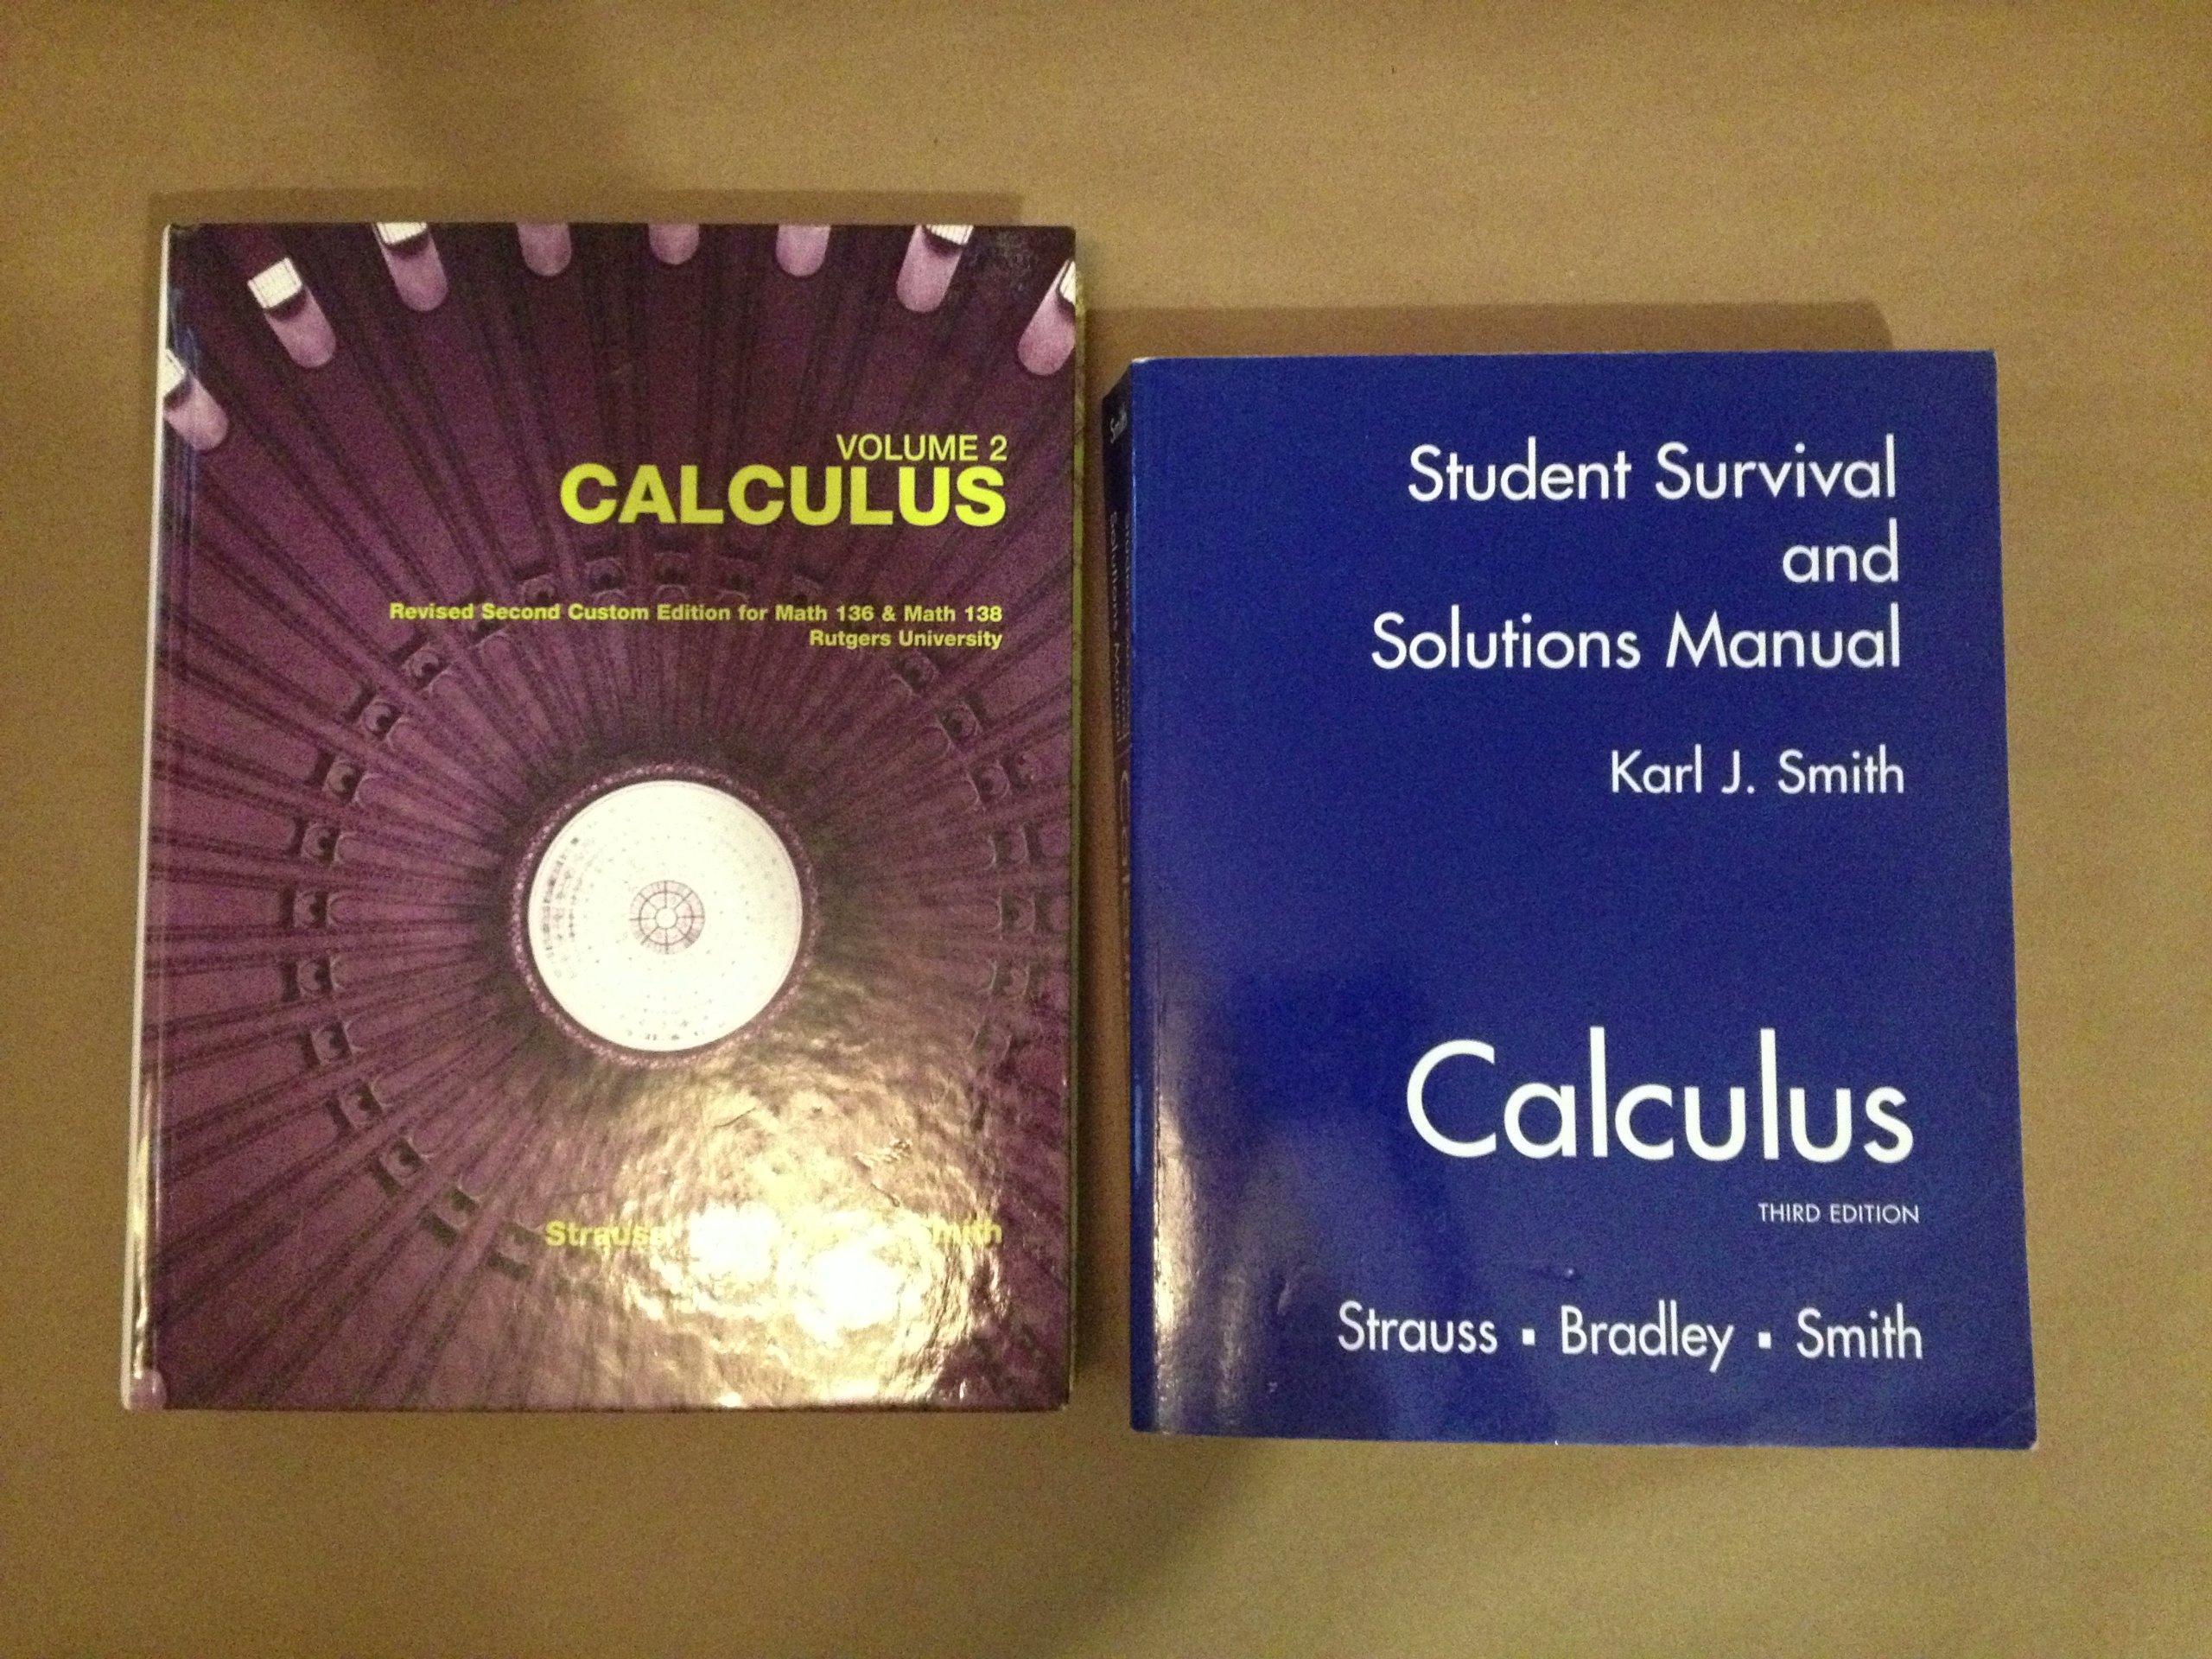 volume 2 calculus revised second custom edition for match 136 math rh amazon com